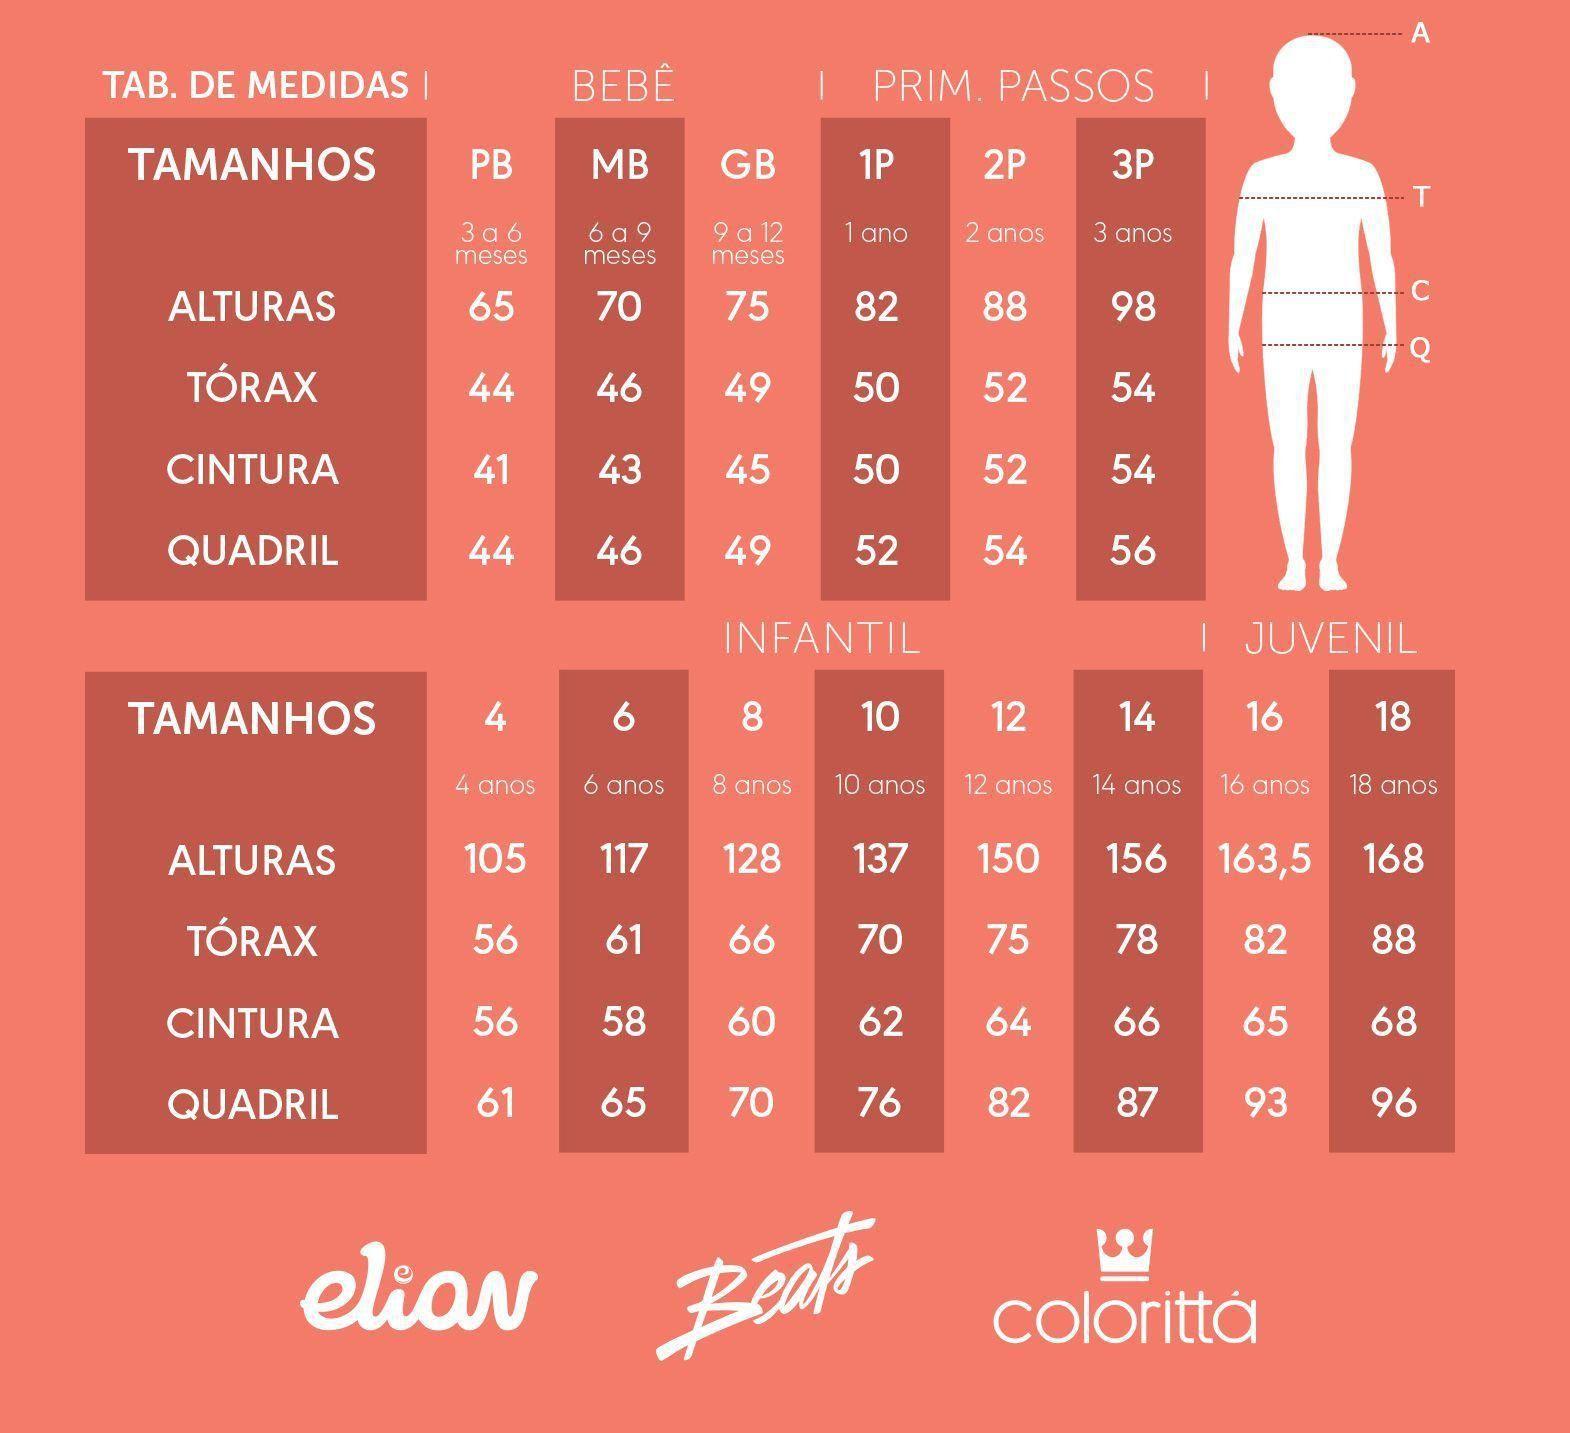 Legging Infantil Preta Elian: Tabela de medidas